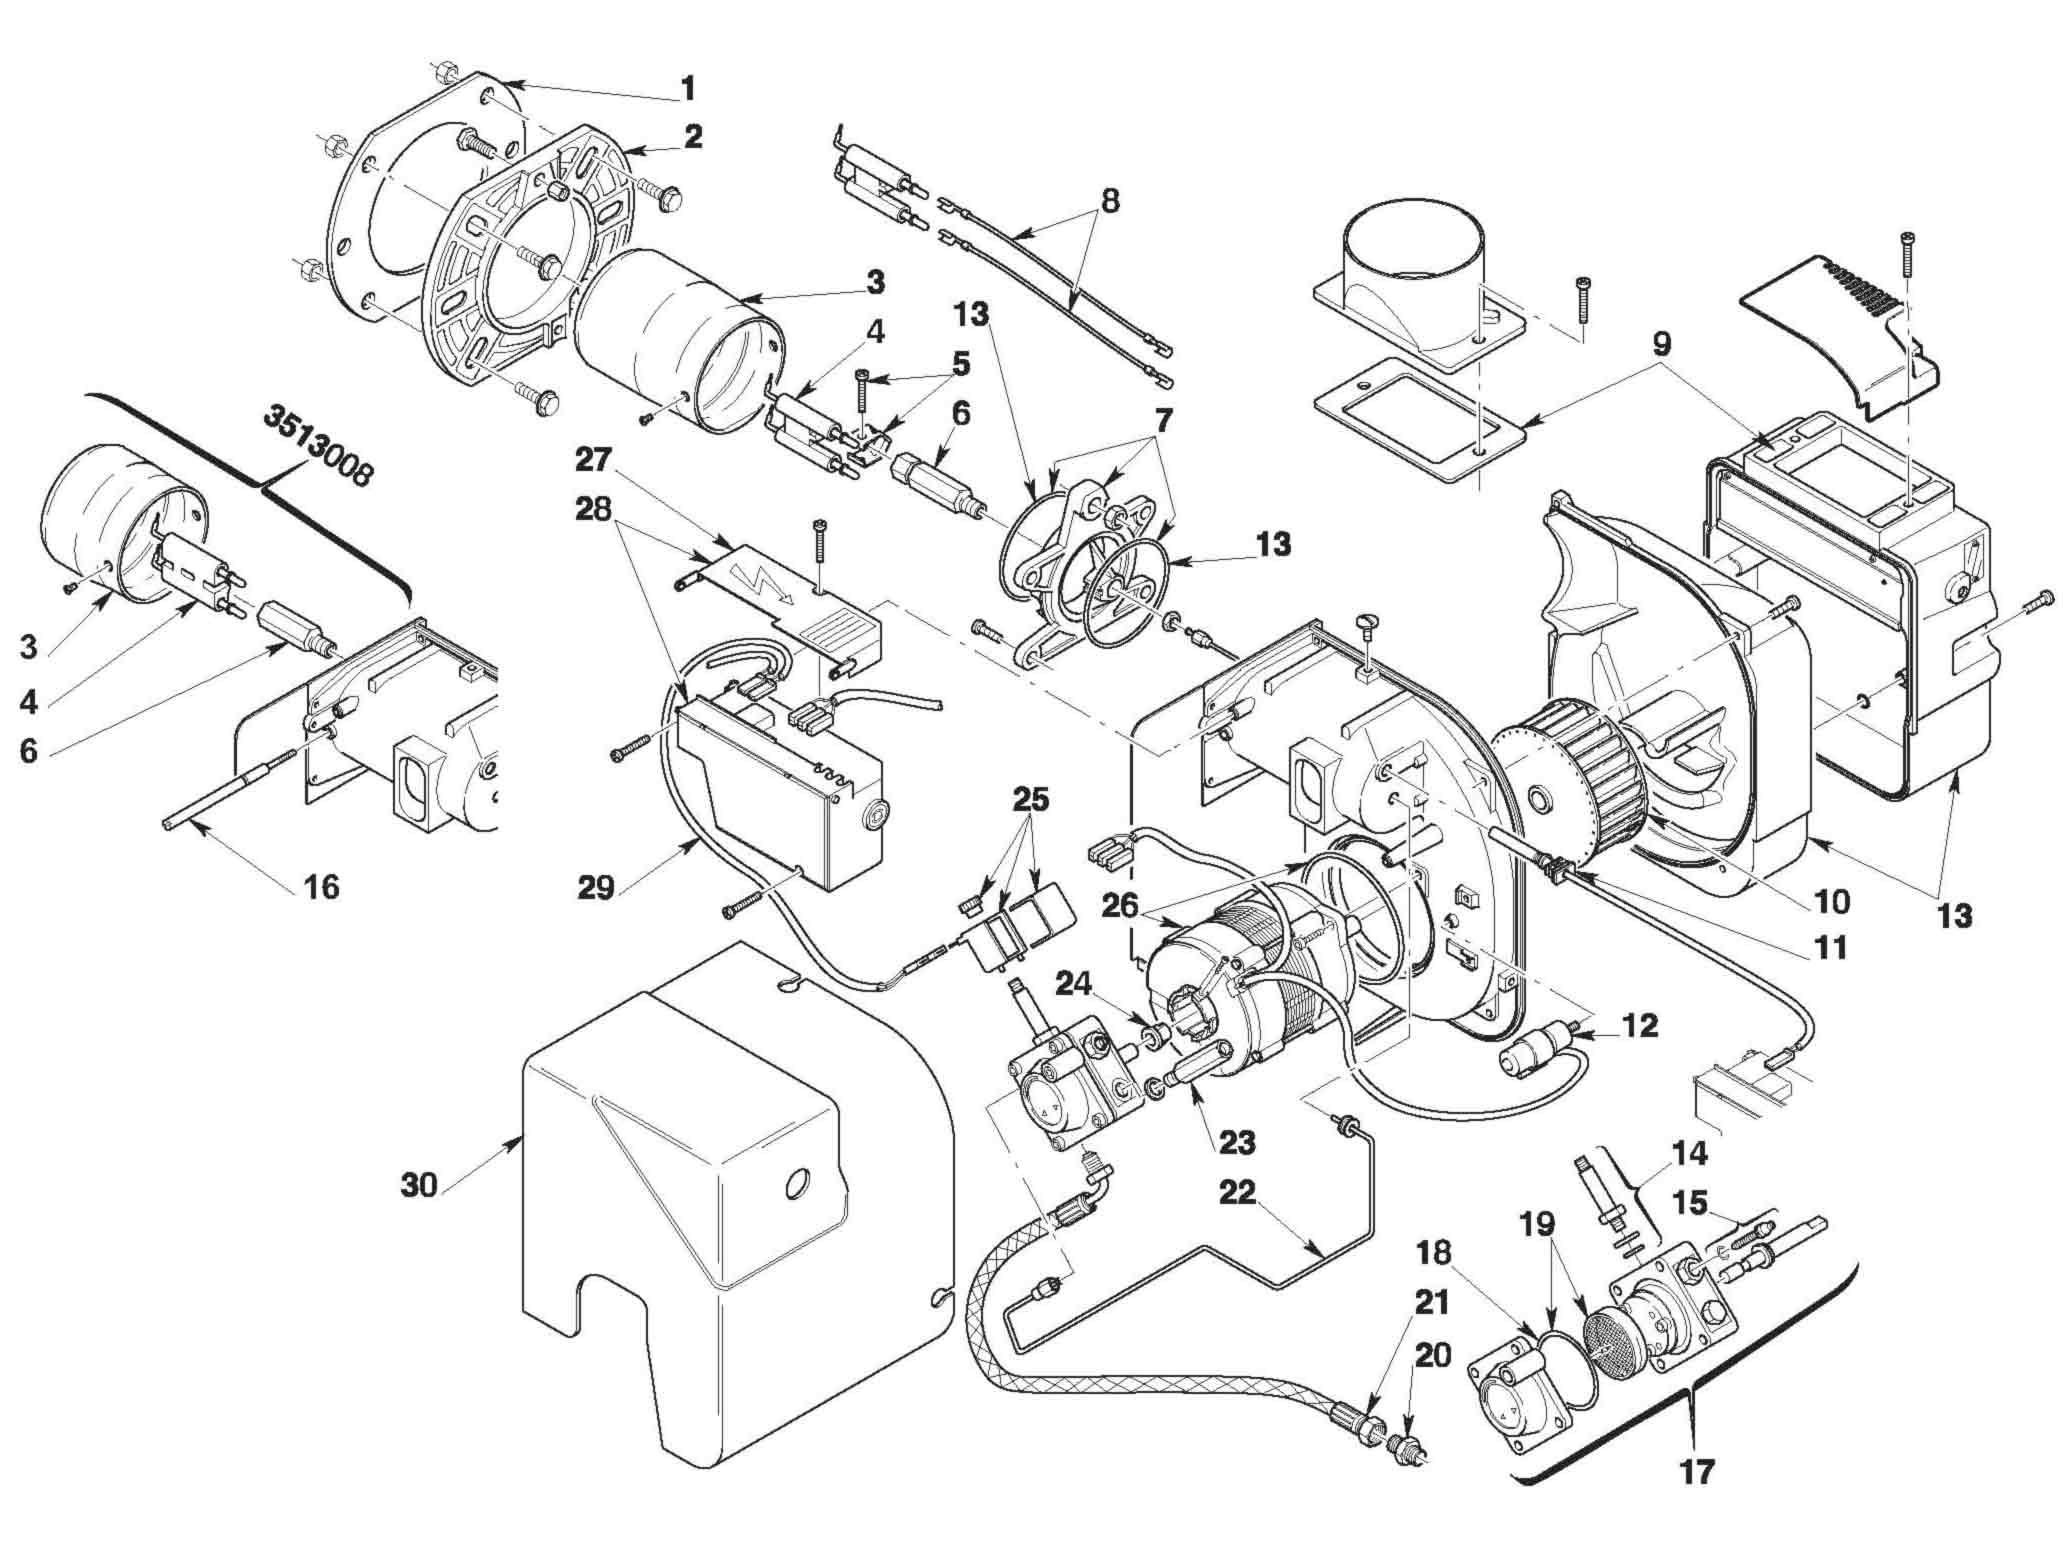 Riello Rdb 1 Burner Parts